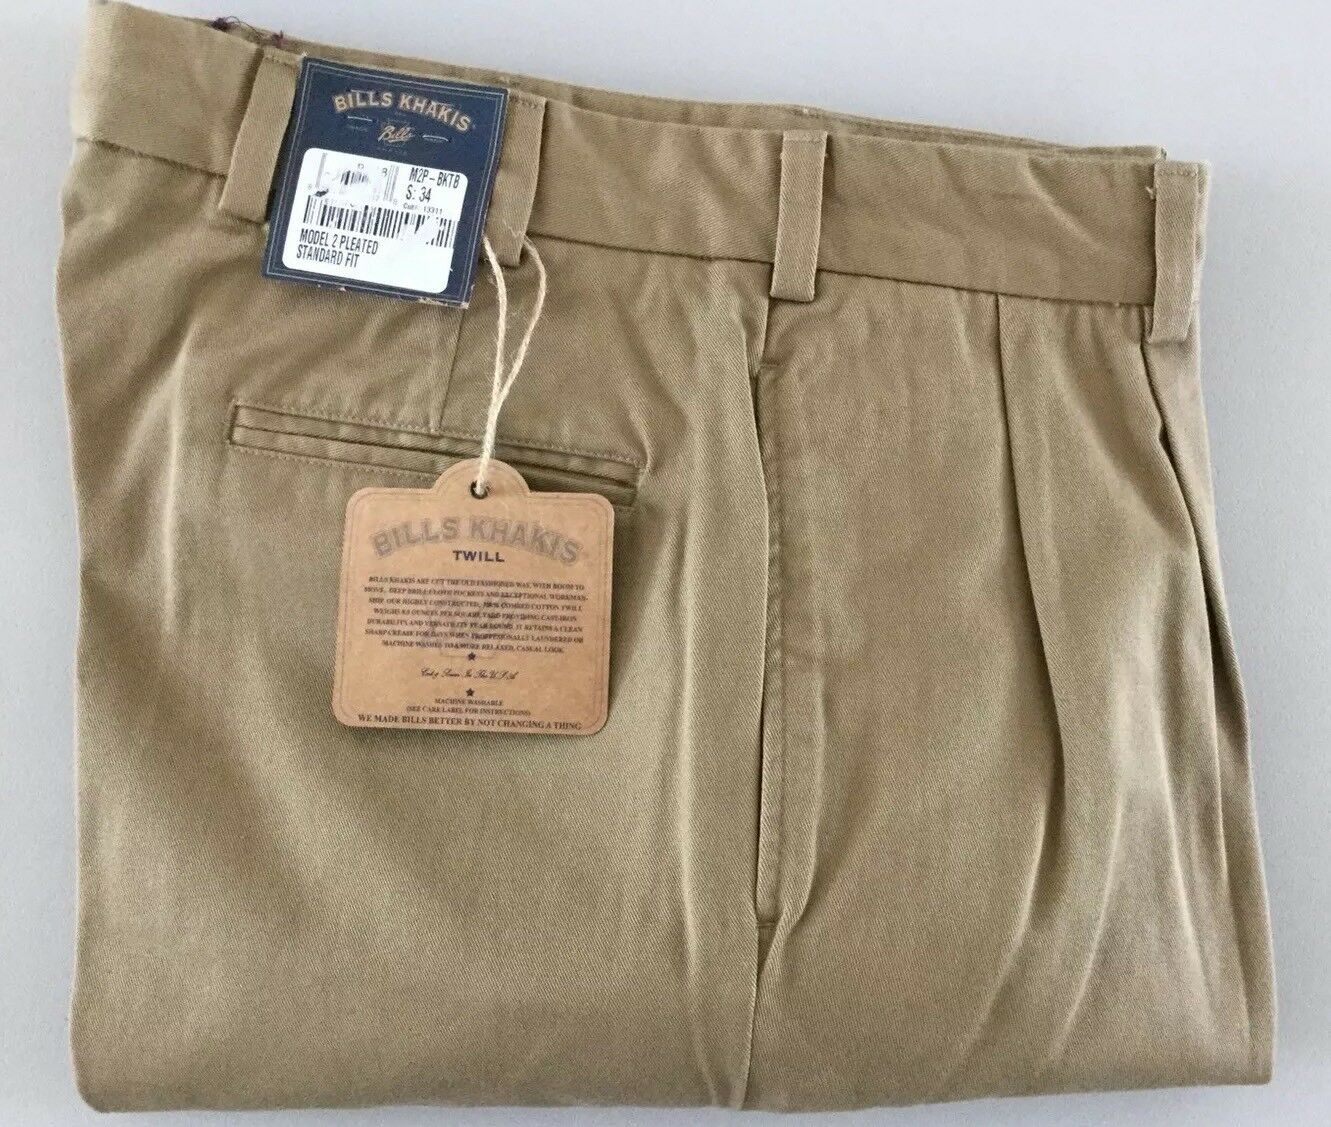 BRAND NEW-Bills khakis M2P-OTBK Size 34 TWILL BRITISH KHAKI MSRP